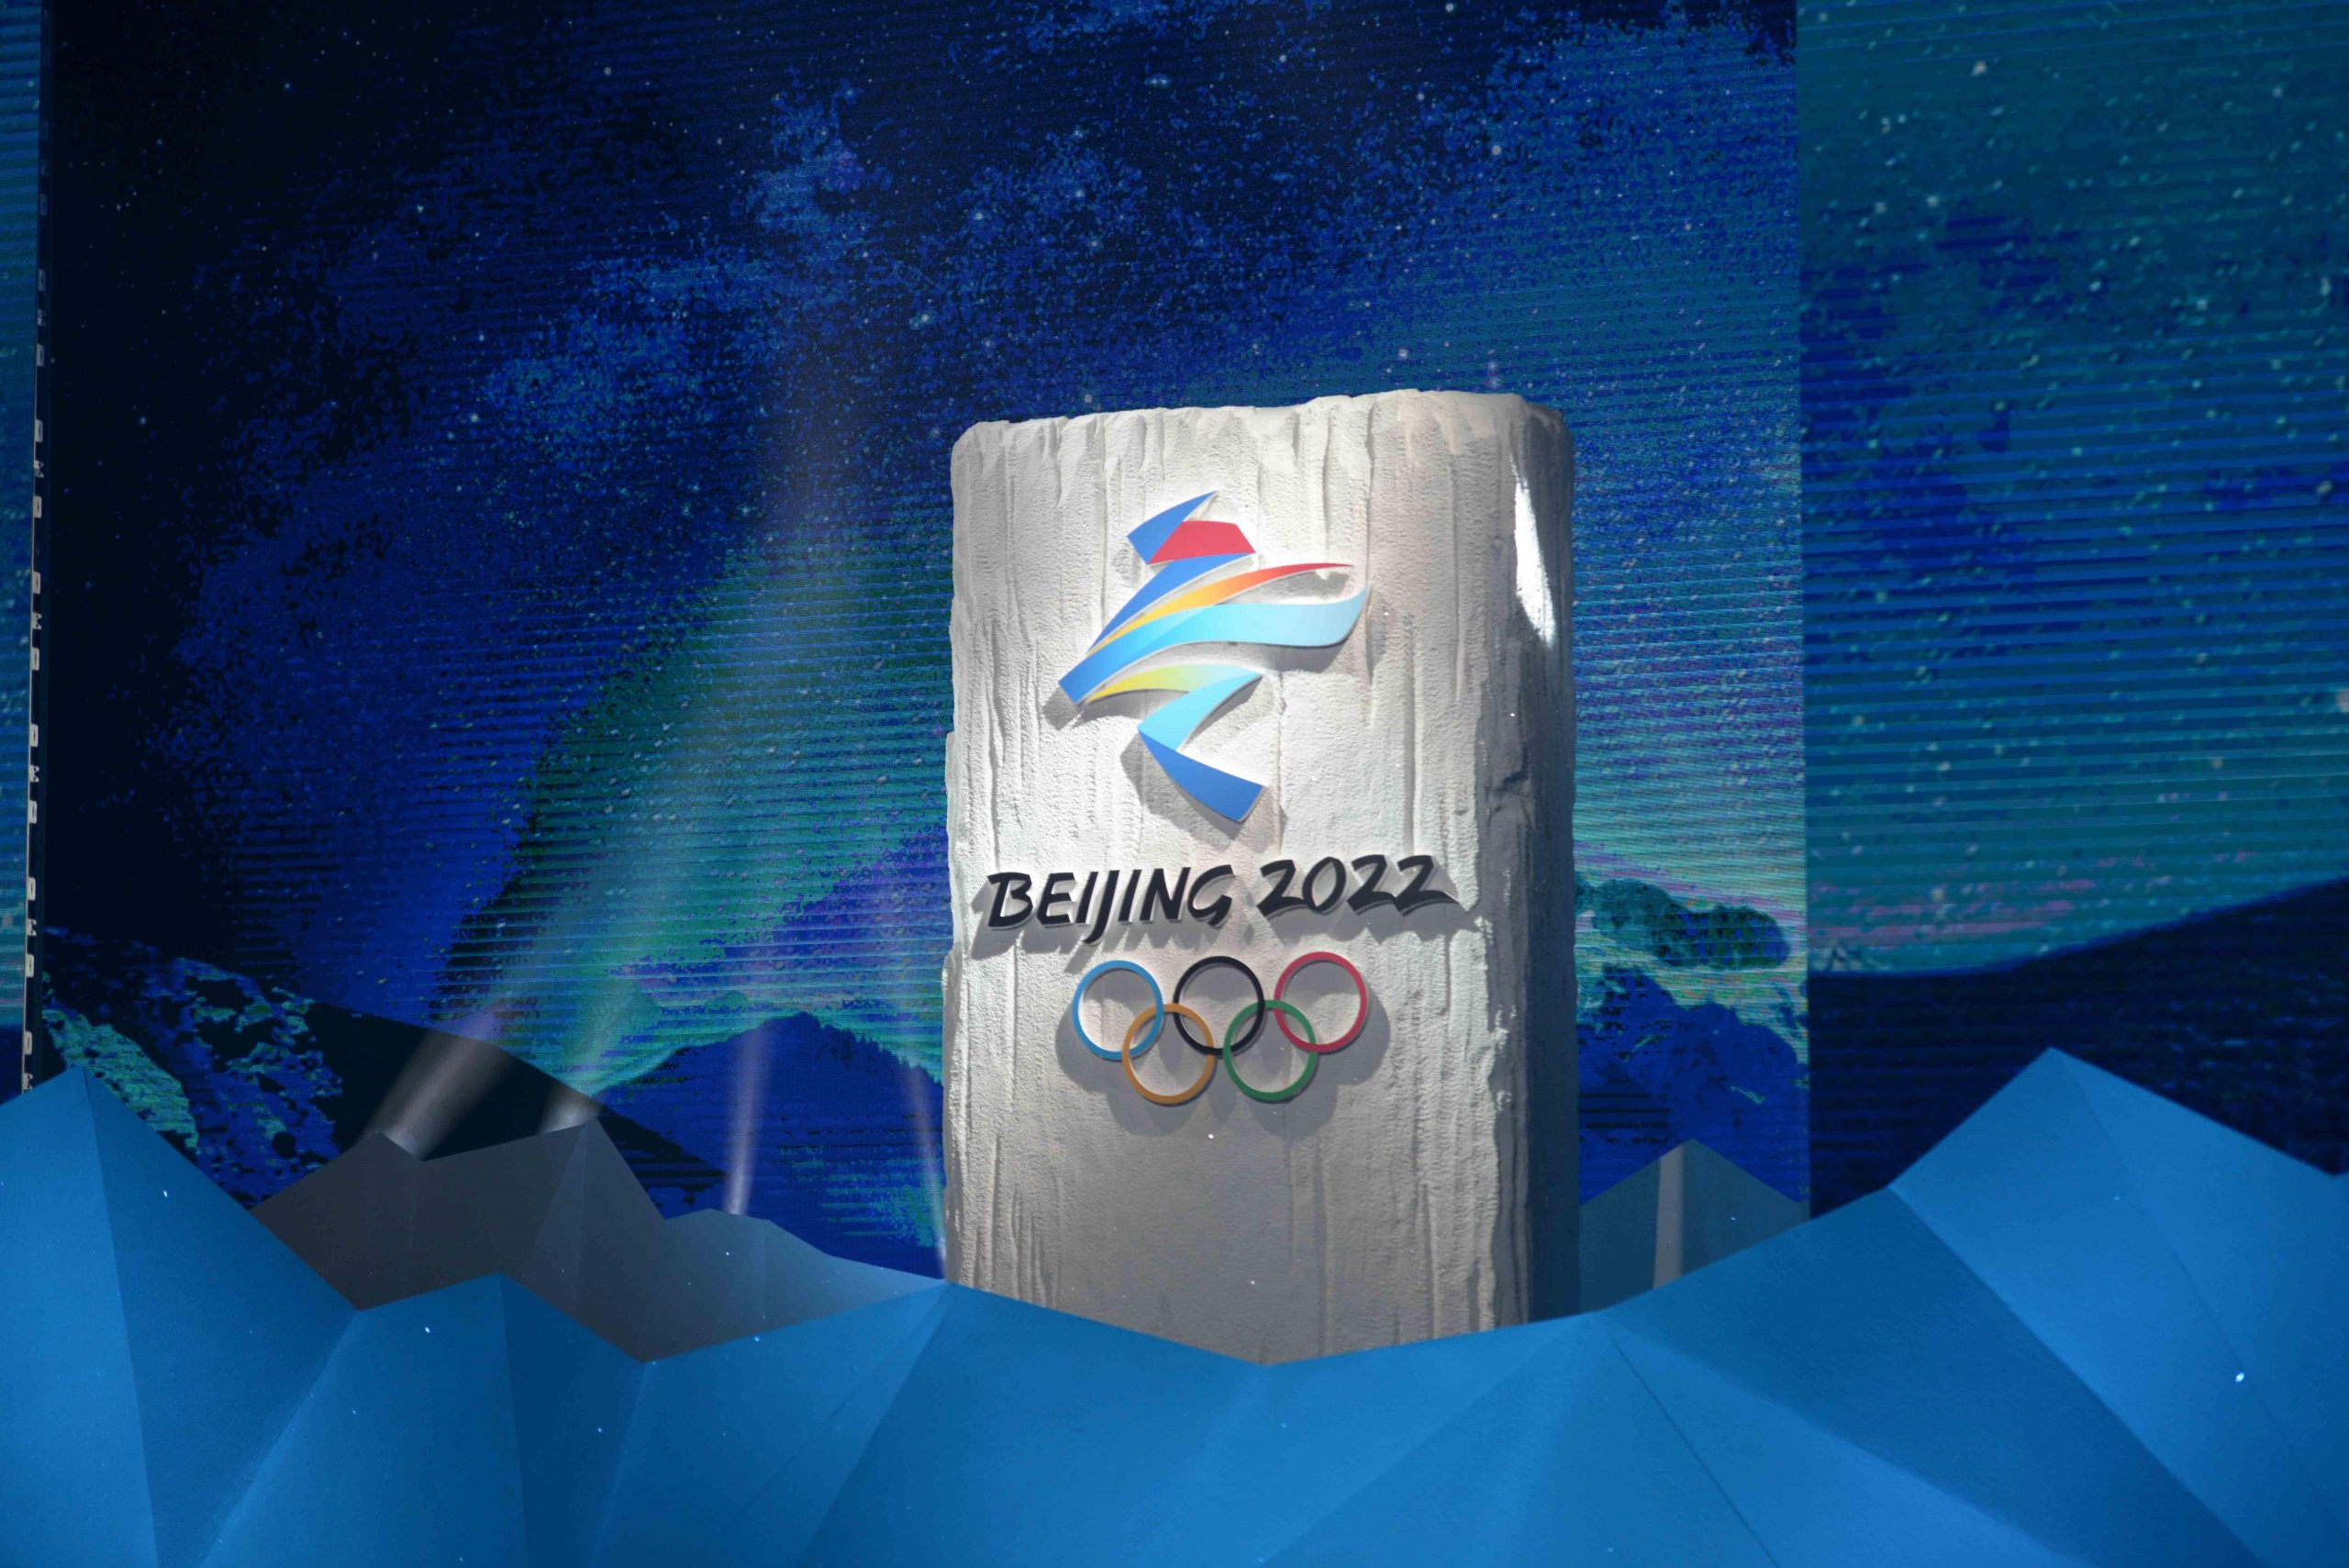 Streama OS 2022 (Vinter) – TV, Live stream & Tablå